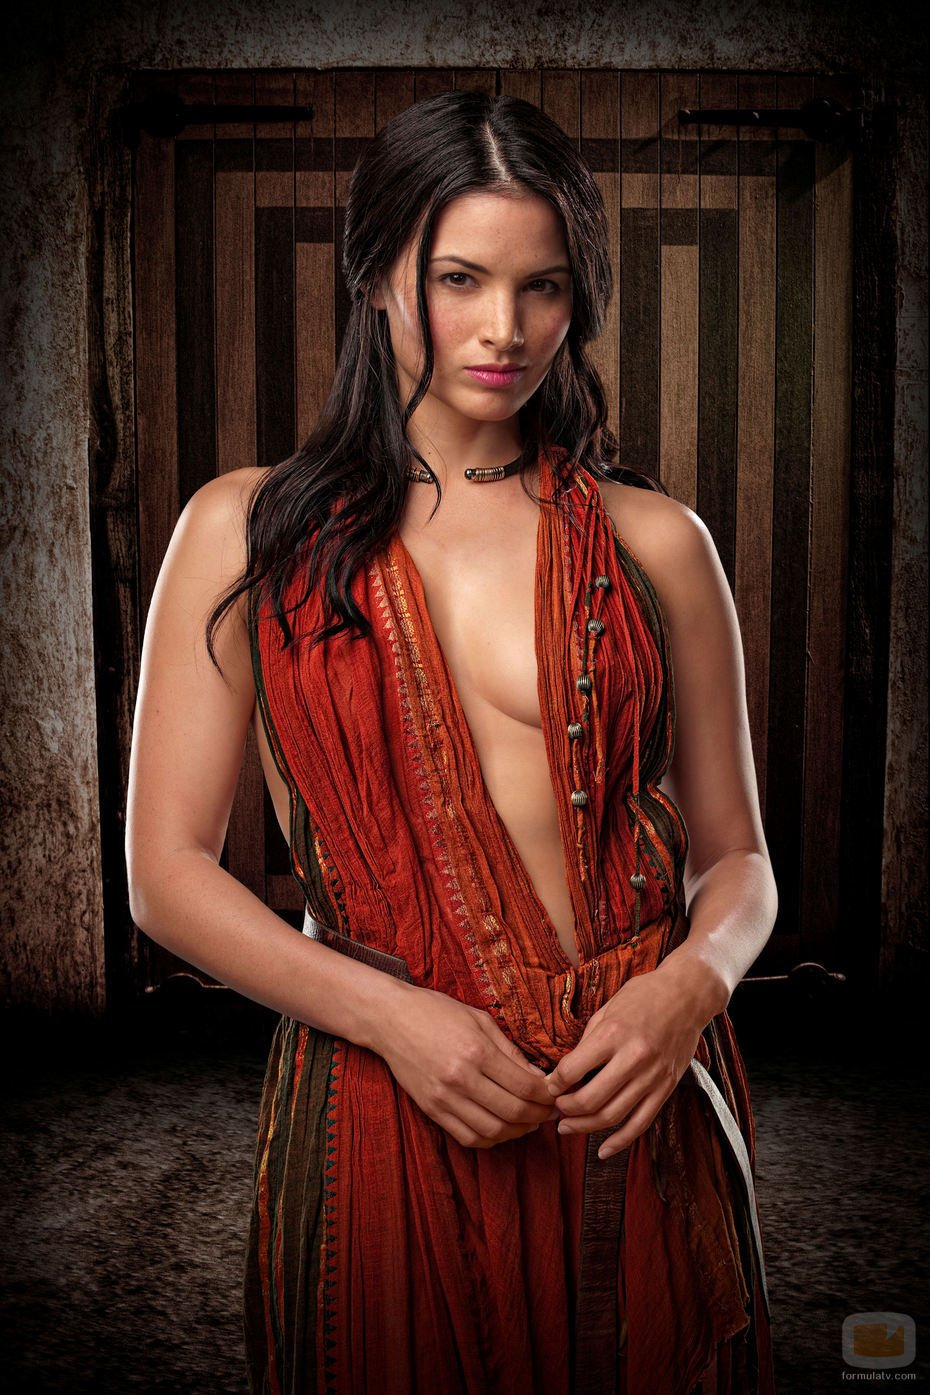 Spartacus: Vengeance. Katrina Law as Mira